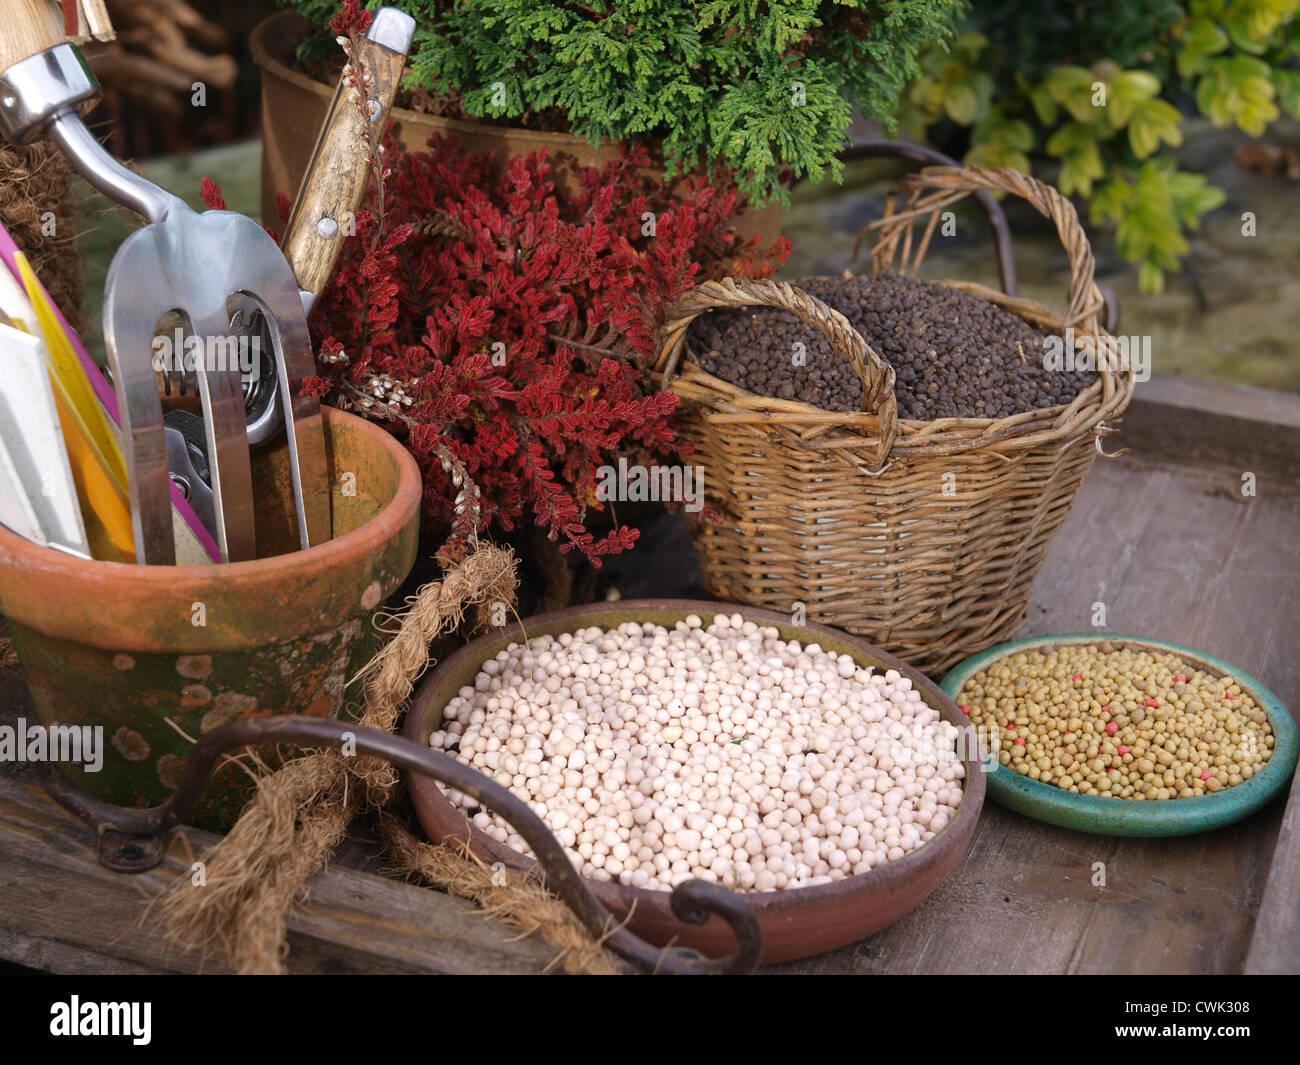 Garden Fertilizer Stock Photos & Garden Fertilizer Stock Images - Alamy